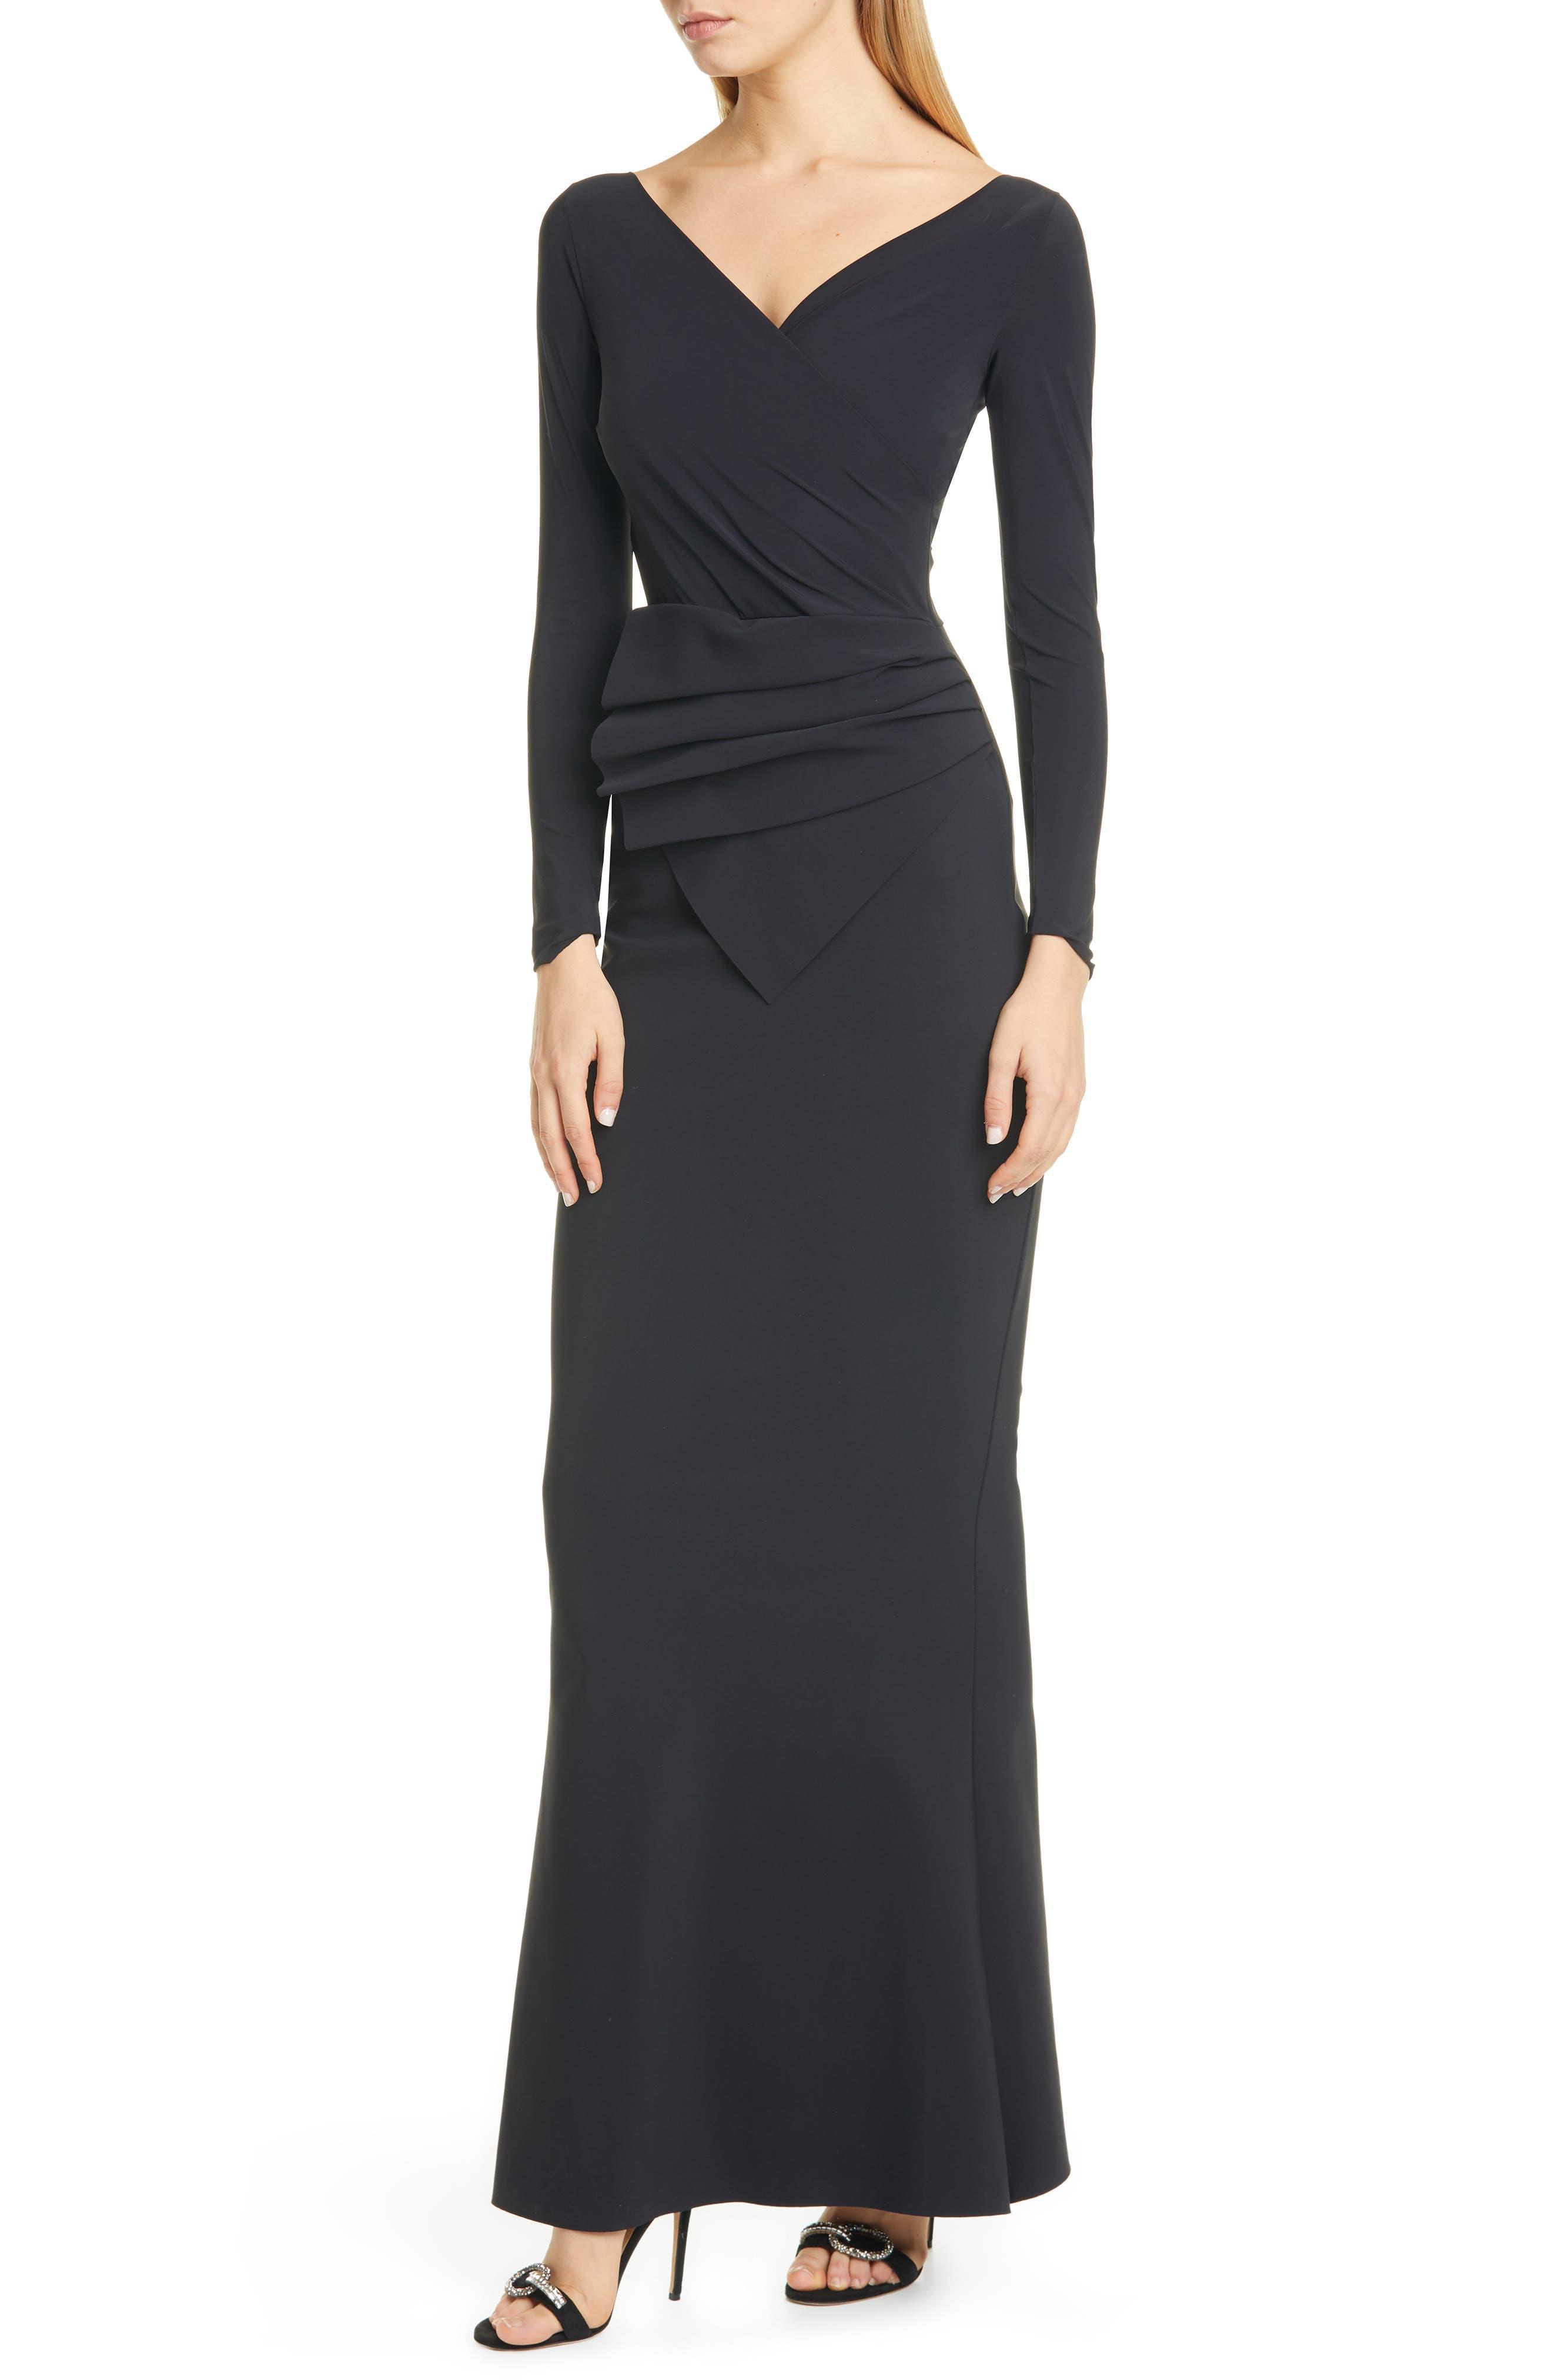 Kaya Long Sleeve Ruffle Gown